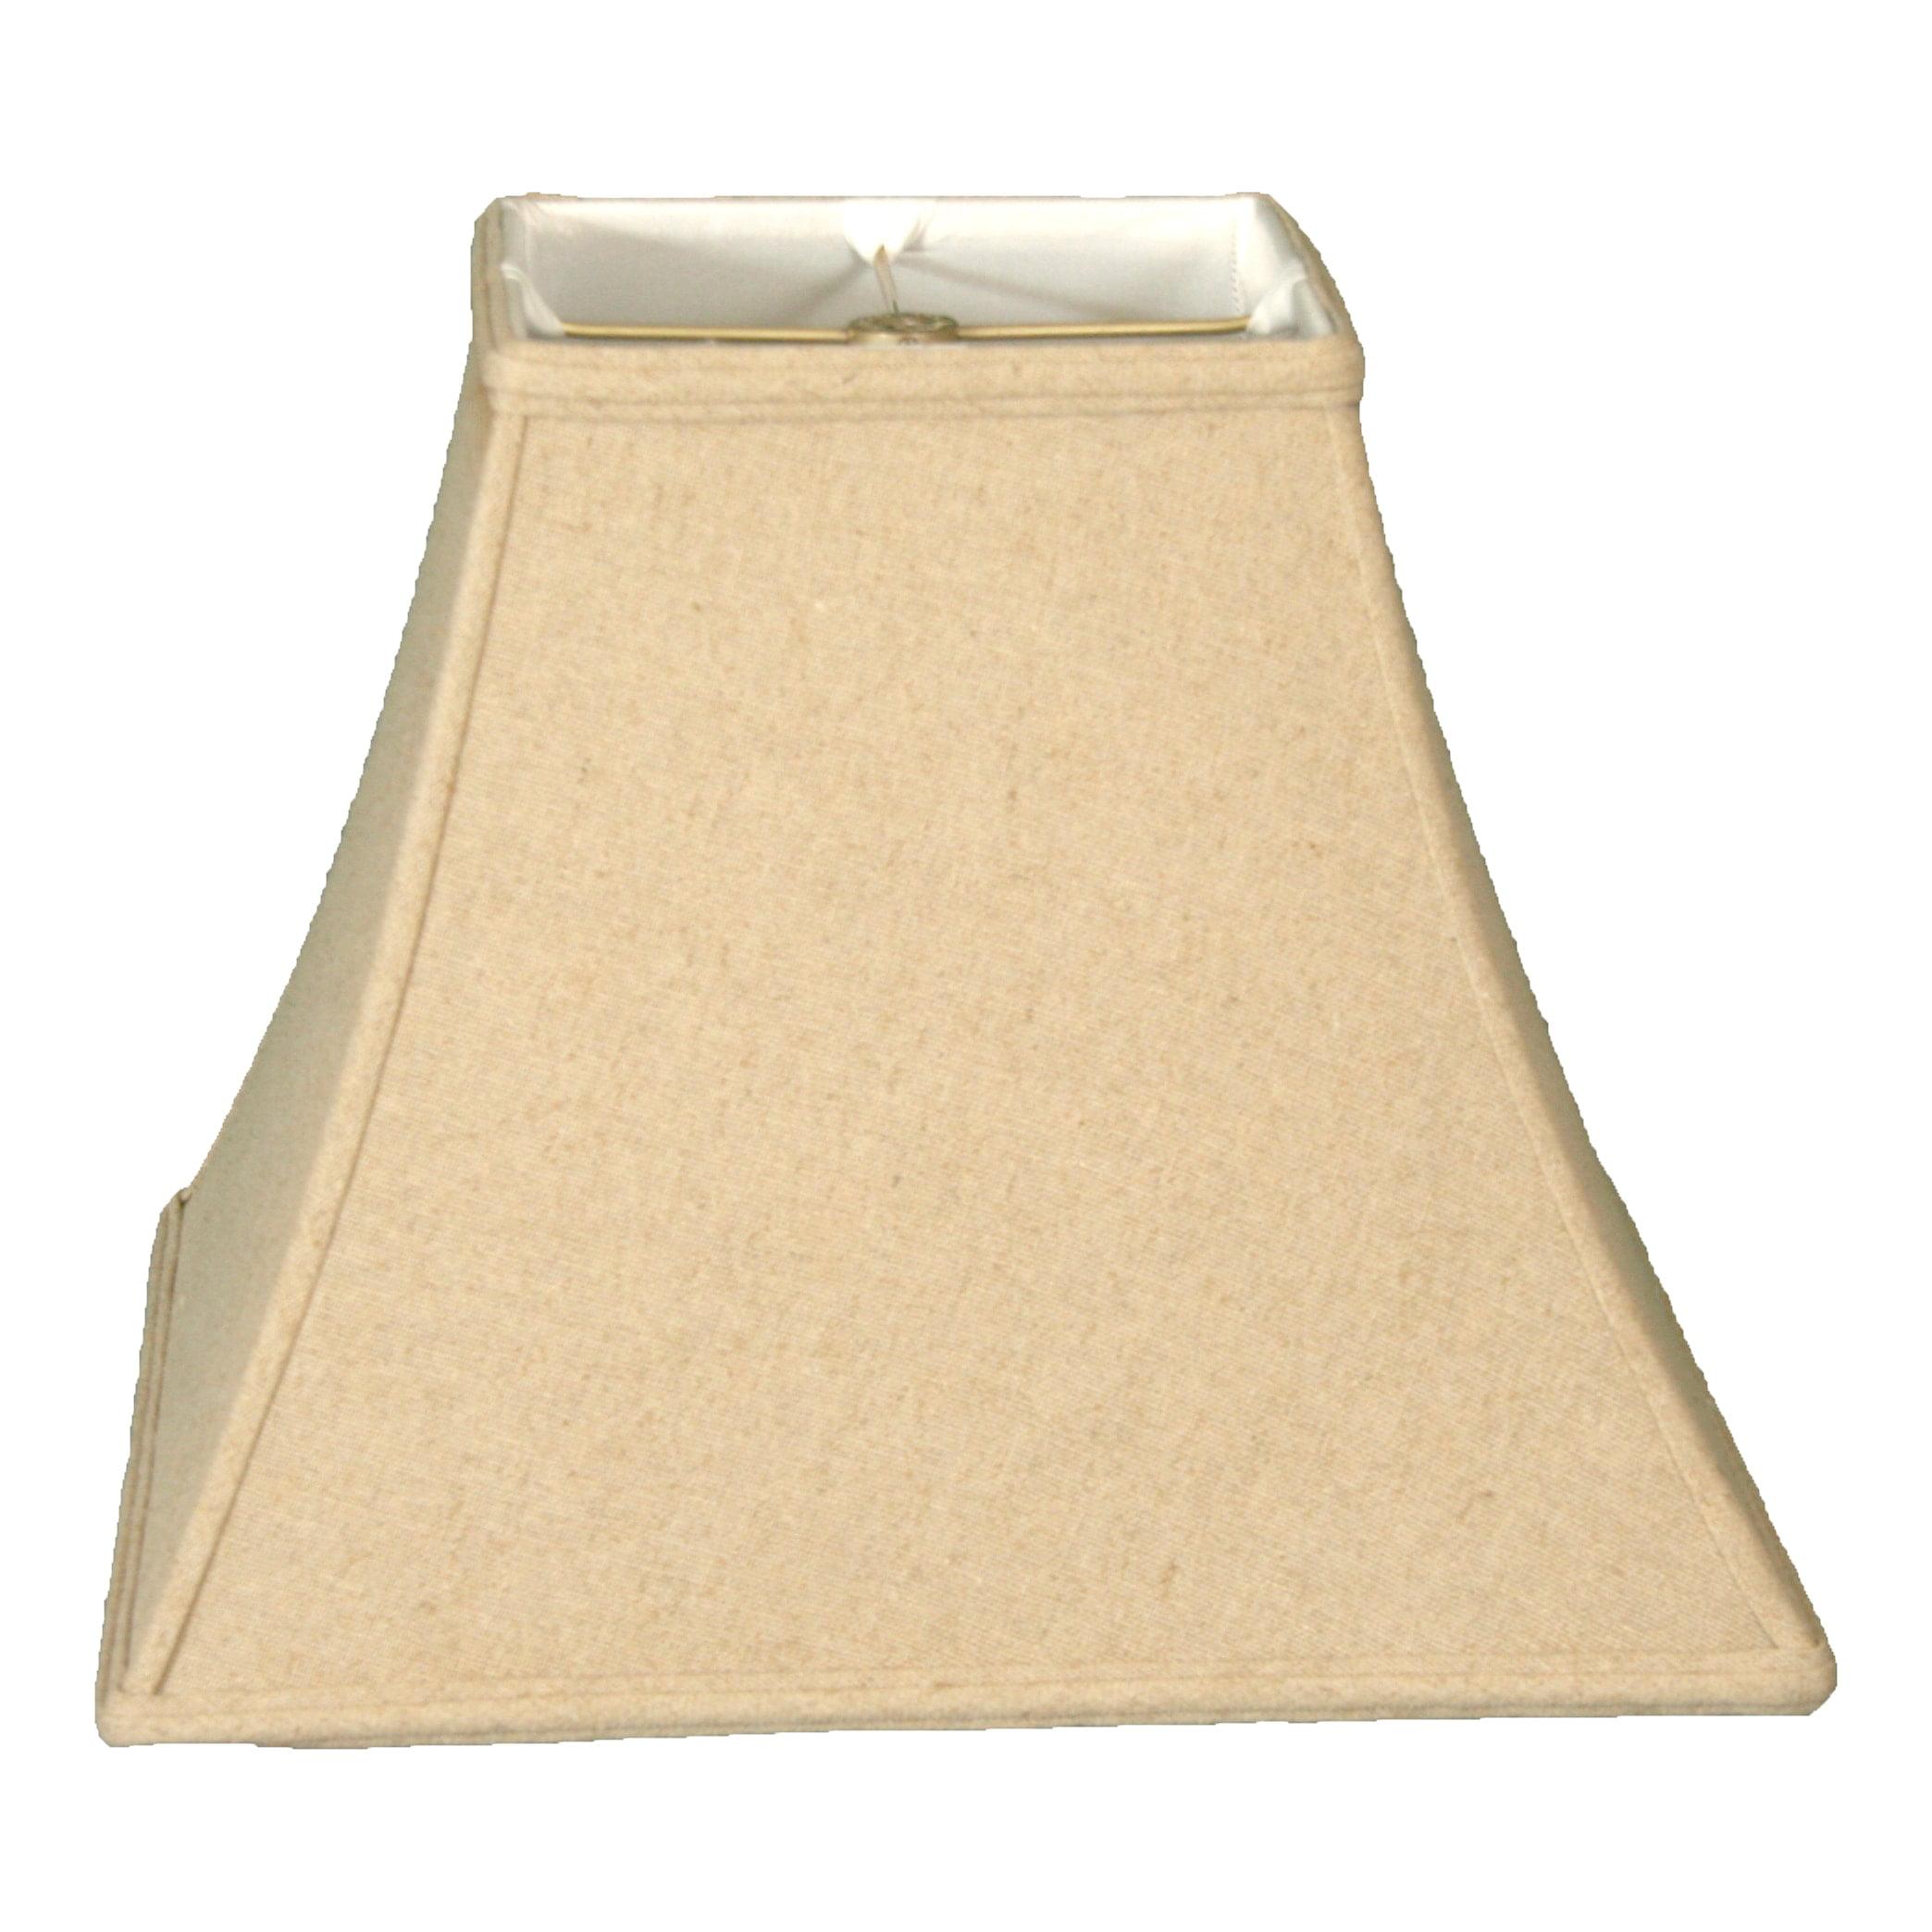 Picture of: Royal Designs 12 Square Bell Lamp Shade Linen Cream Walmart Com Walmart Com